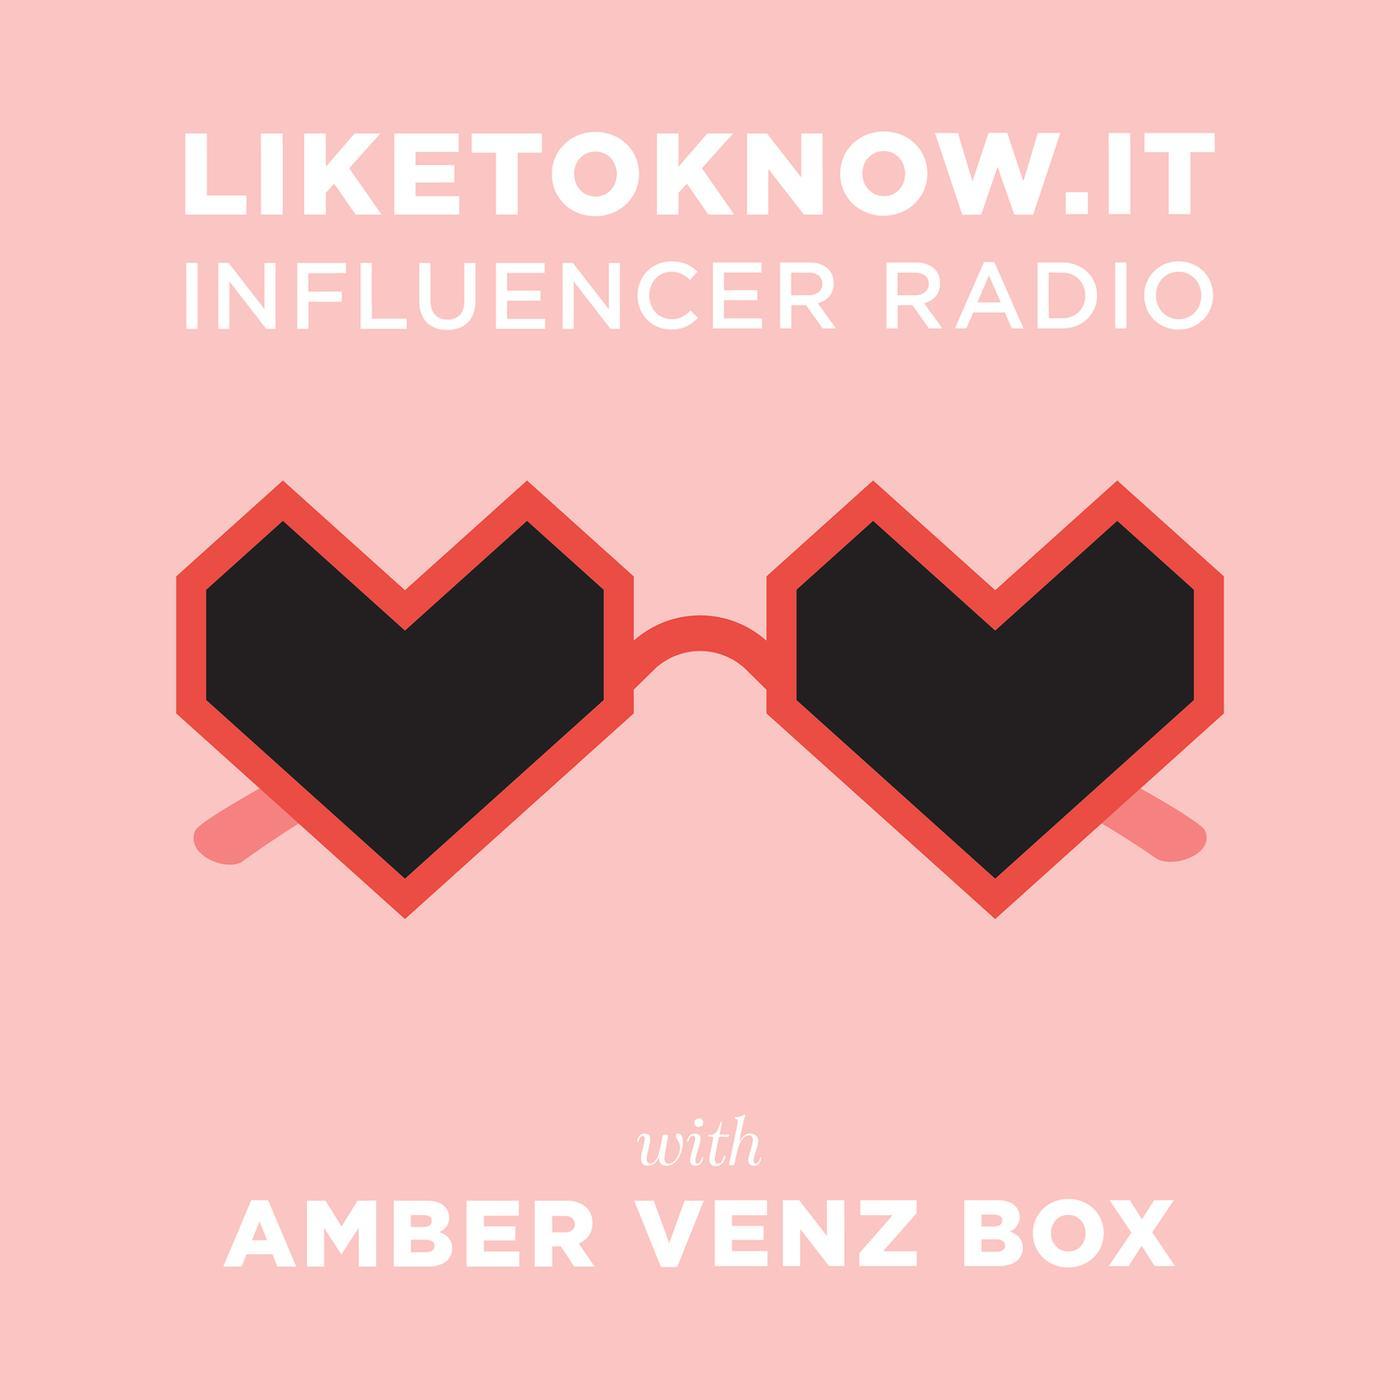 LIKEtoKNOW it Influencer Radio (podcast) - Amber Venz Box